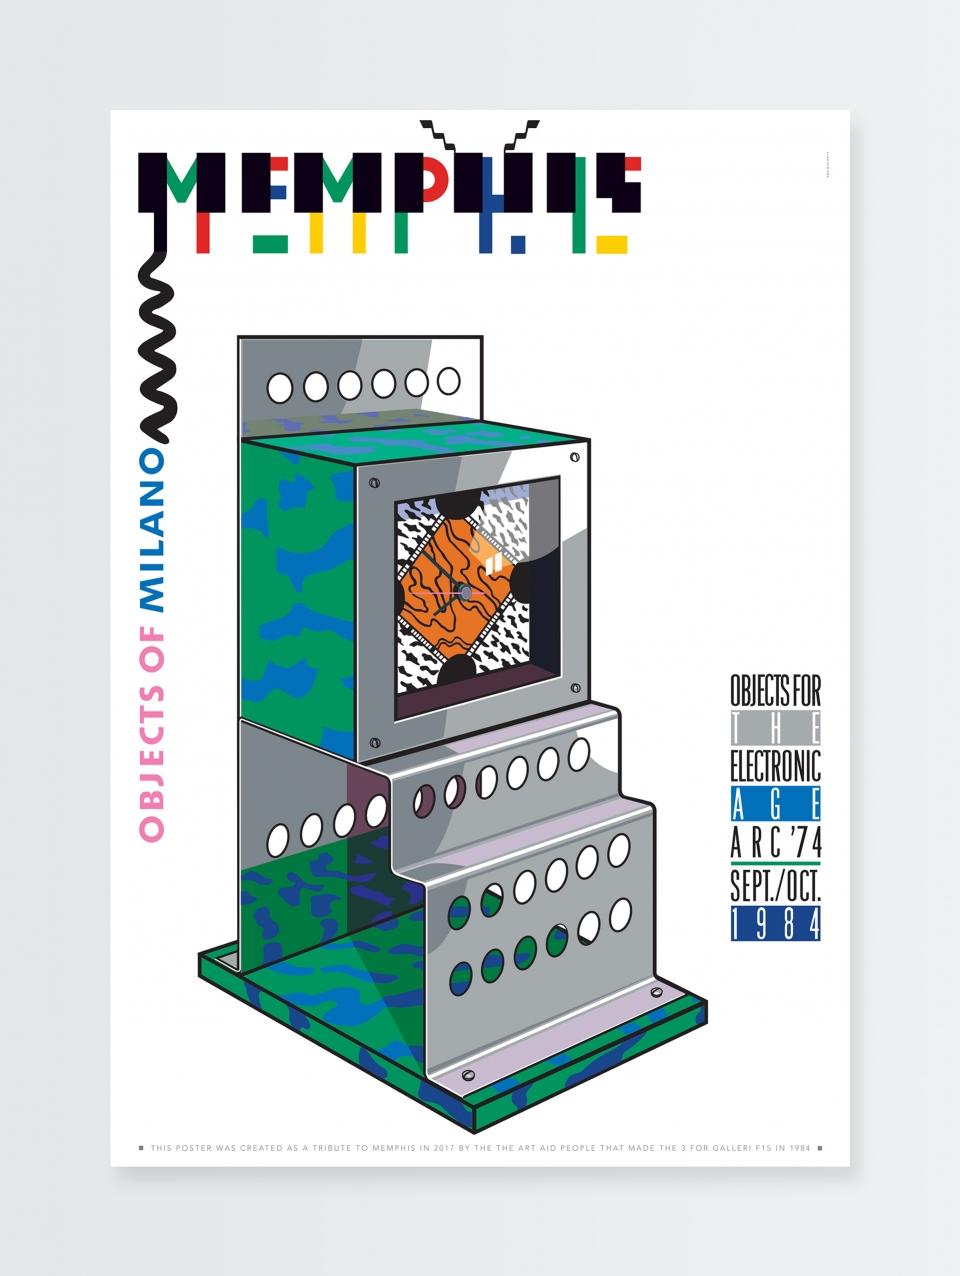 Poster_Table_Clock_Plakat_Art_Aid_1984-960x1276.jpg